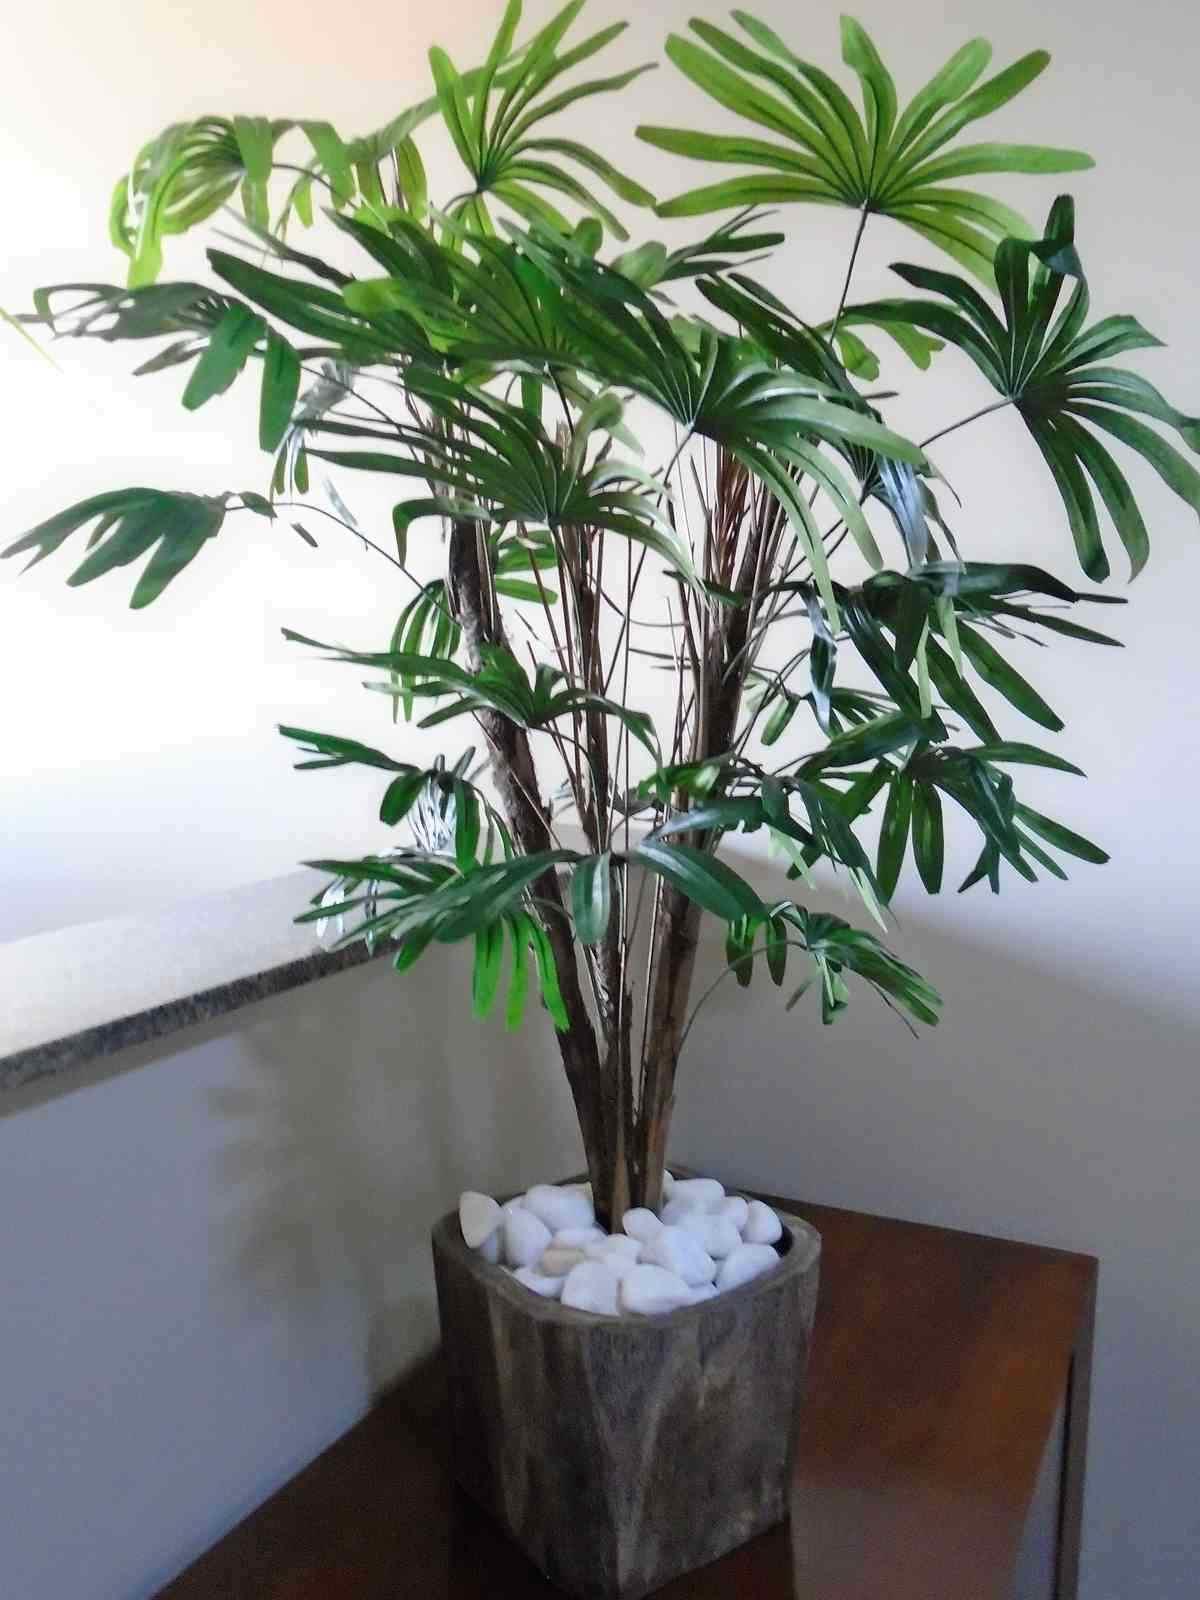 Árvore Artificial Rafia Verde Folhas Tronco Natural 100 Cm